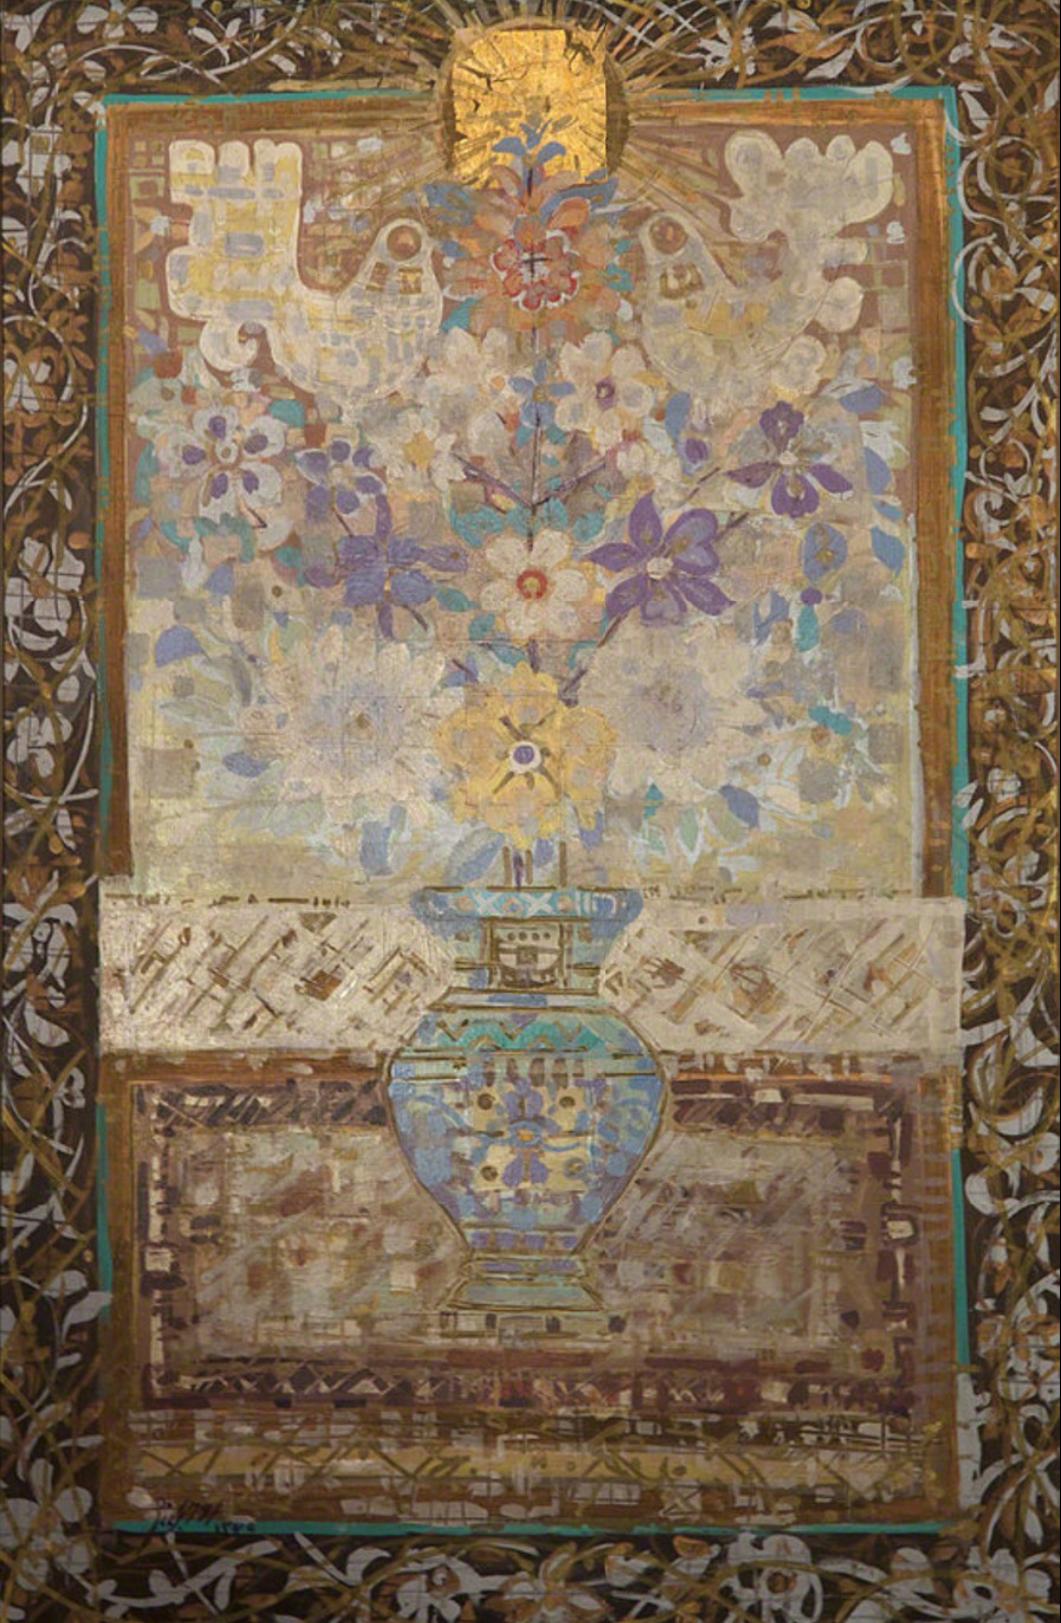 Jafar Rouhbakhsh, Untitled, mixed media on canvas, 90 x 58 cm, 1989